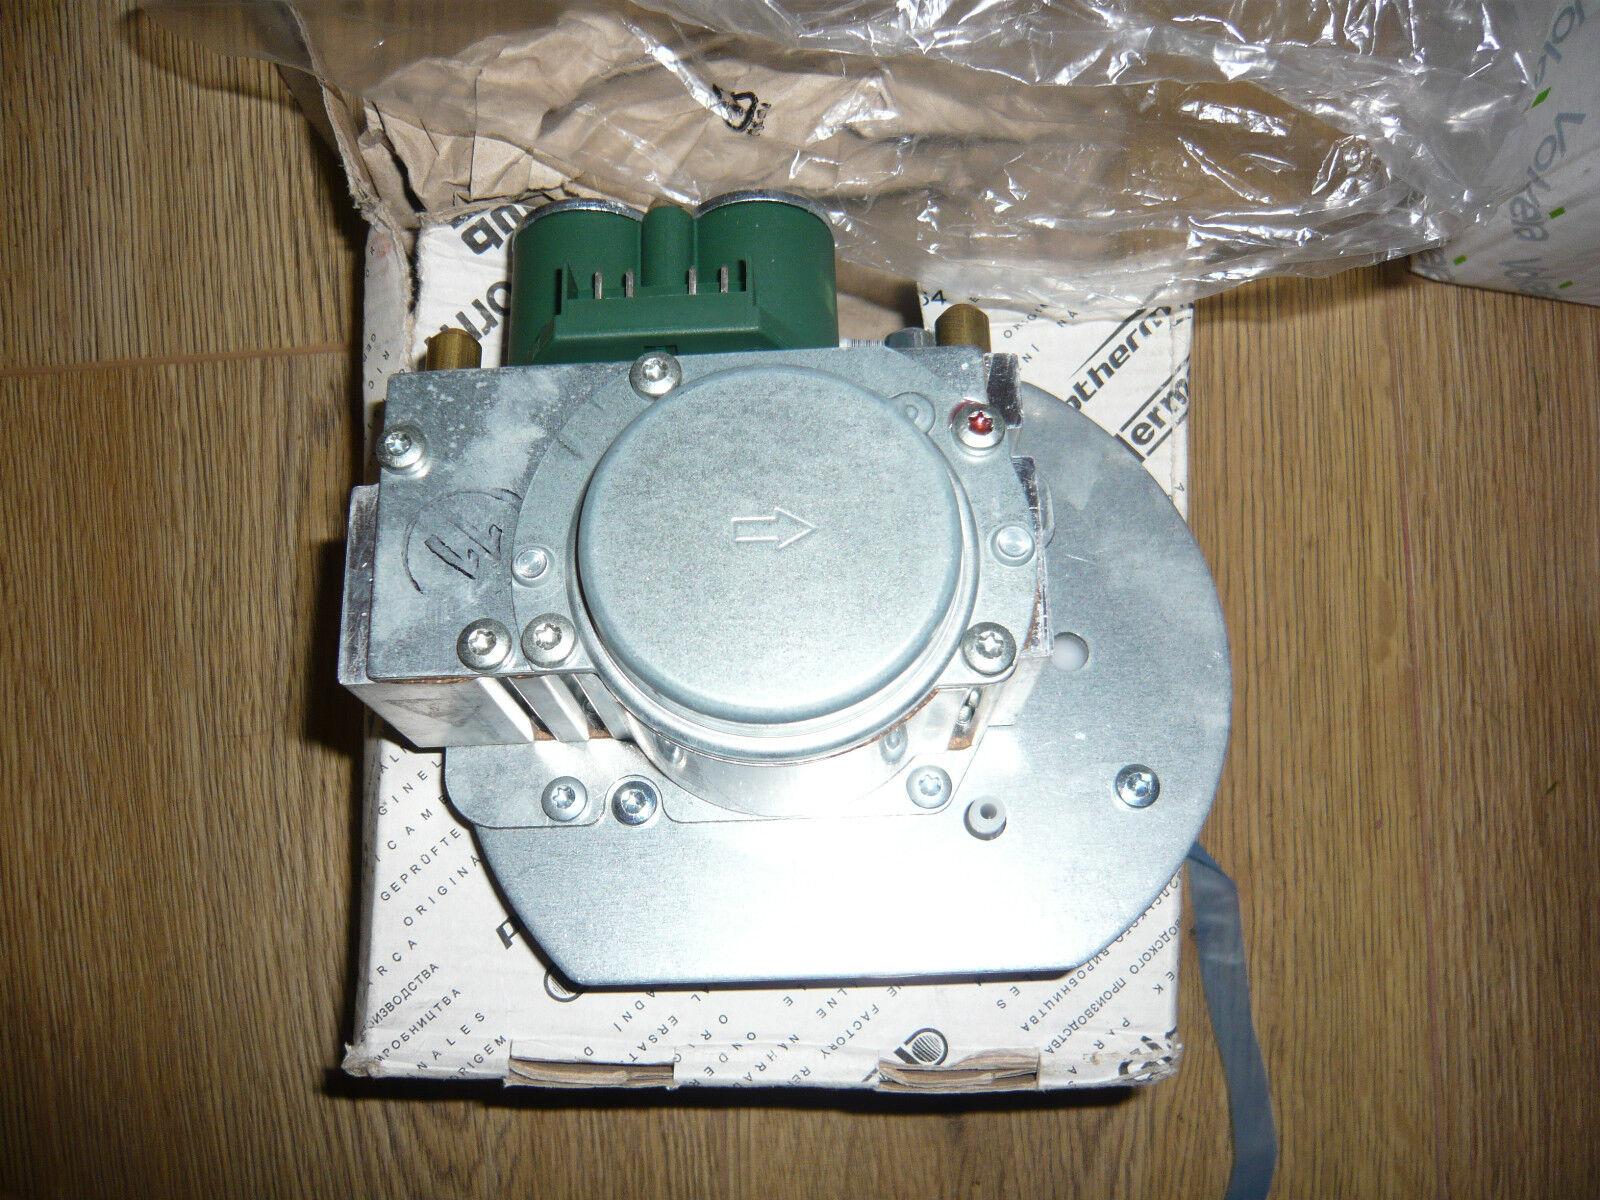 Glowworm HXi SXI CXI Ultracom Gas Valve 2000802664 801649 | eBay